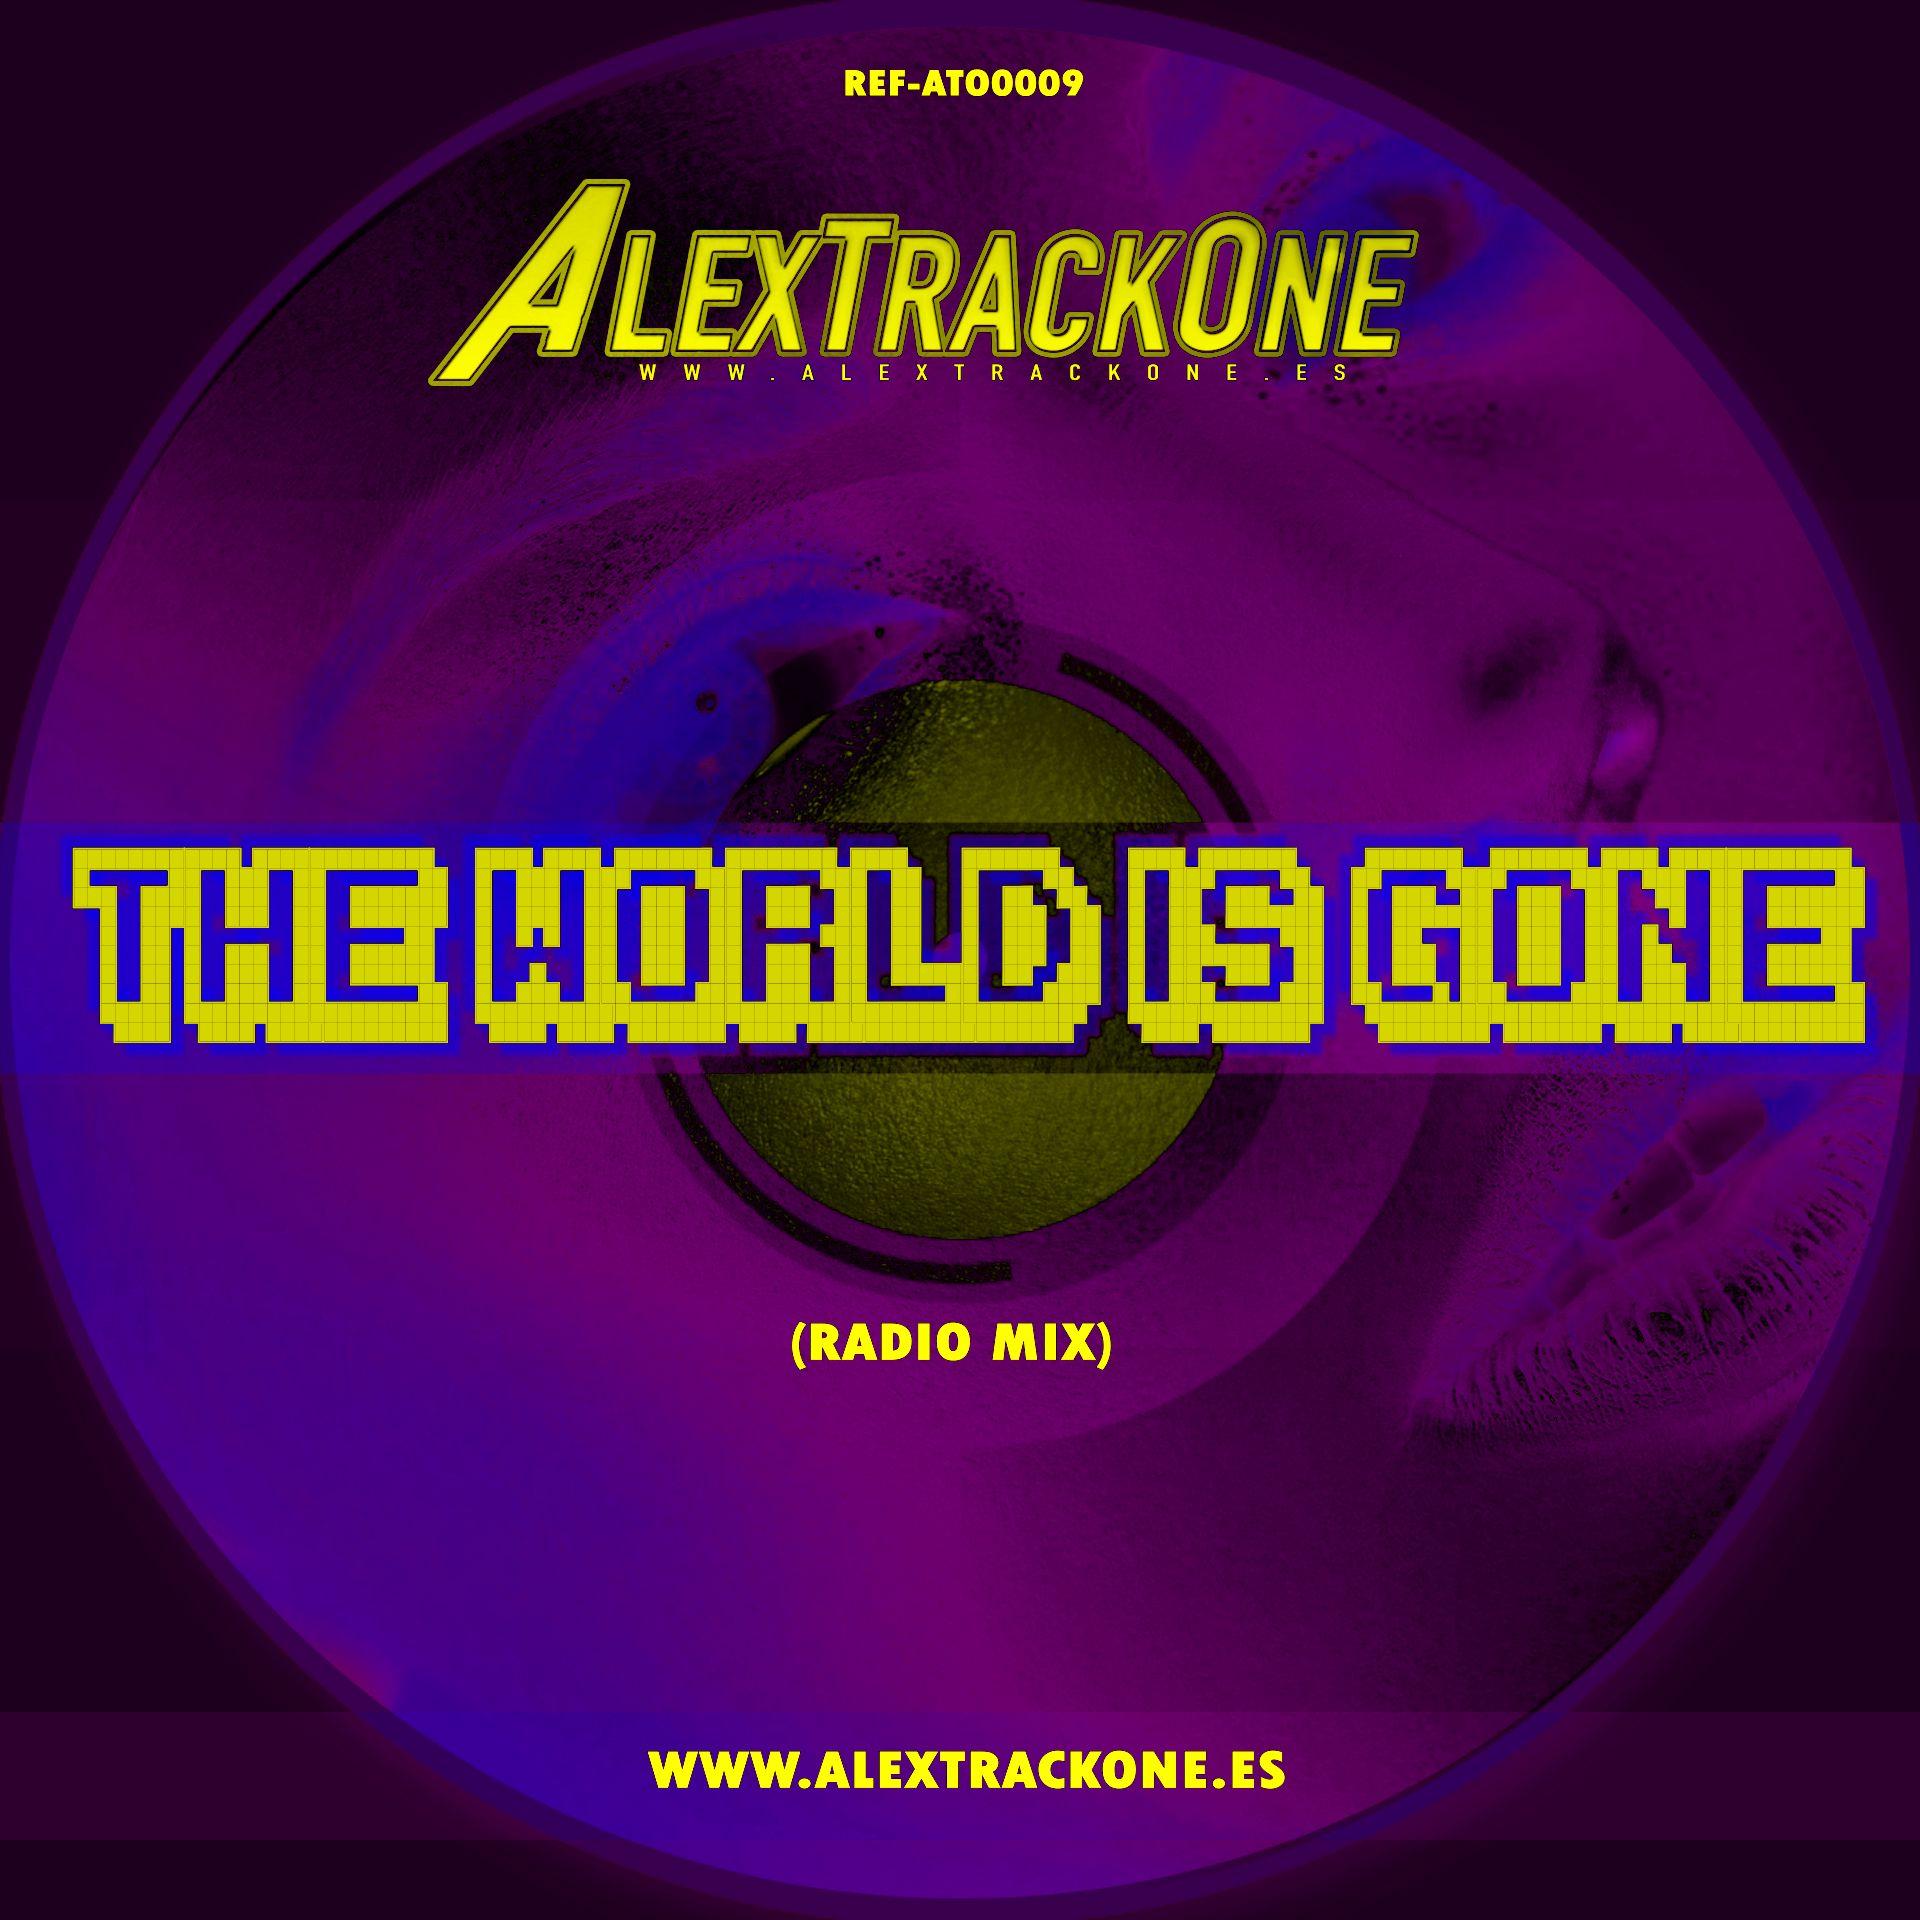 REF-ATO0009 THE WORLD IS GONE (ORIGINAL MIX) (MP3 & WAV)